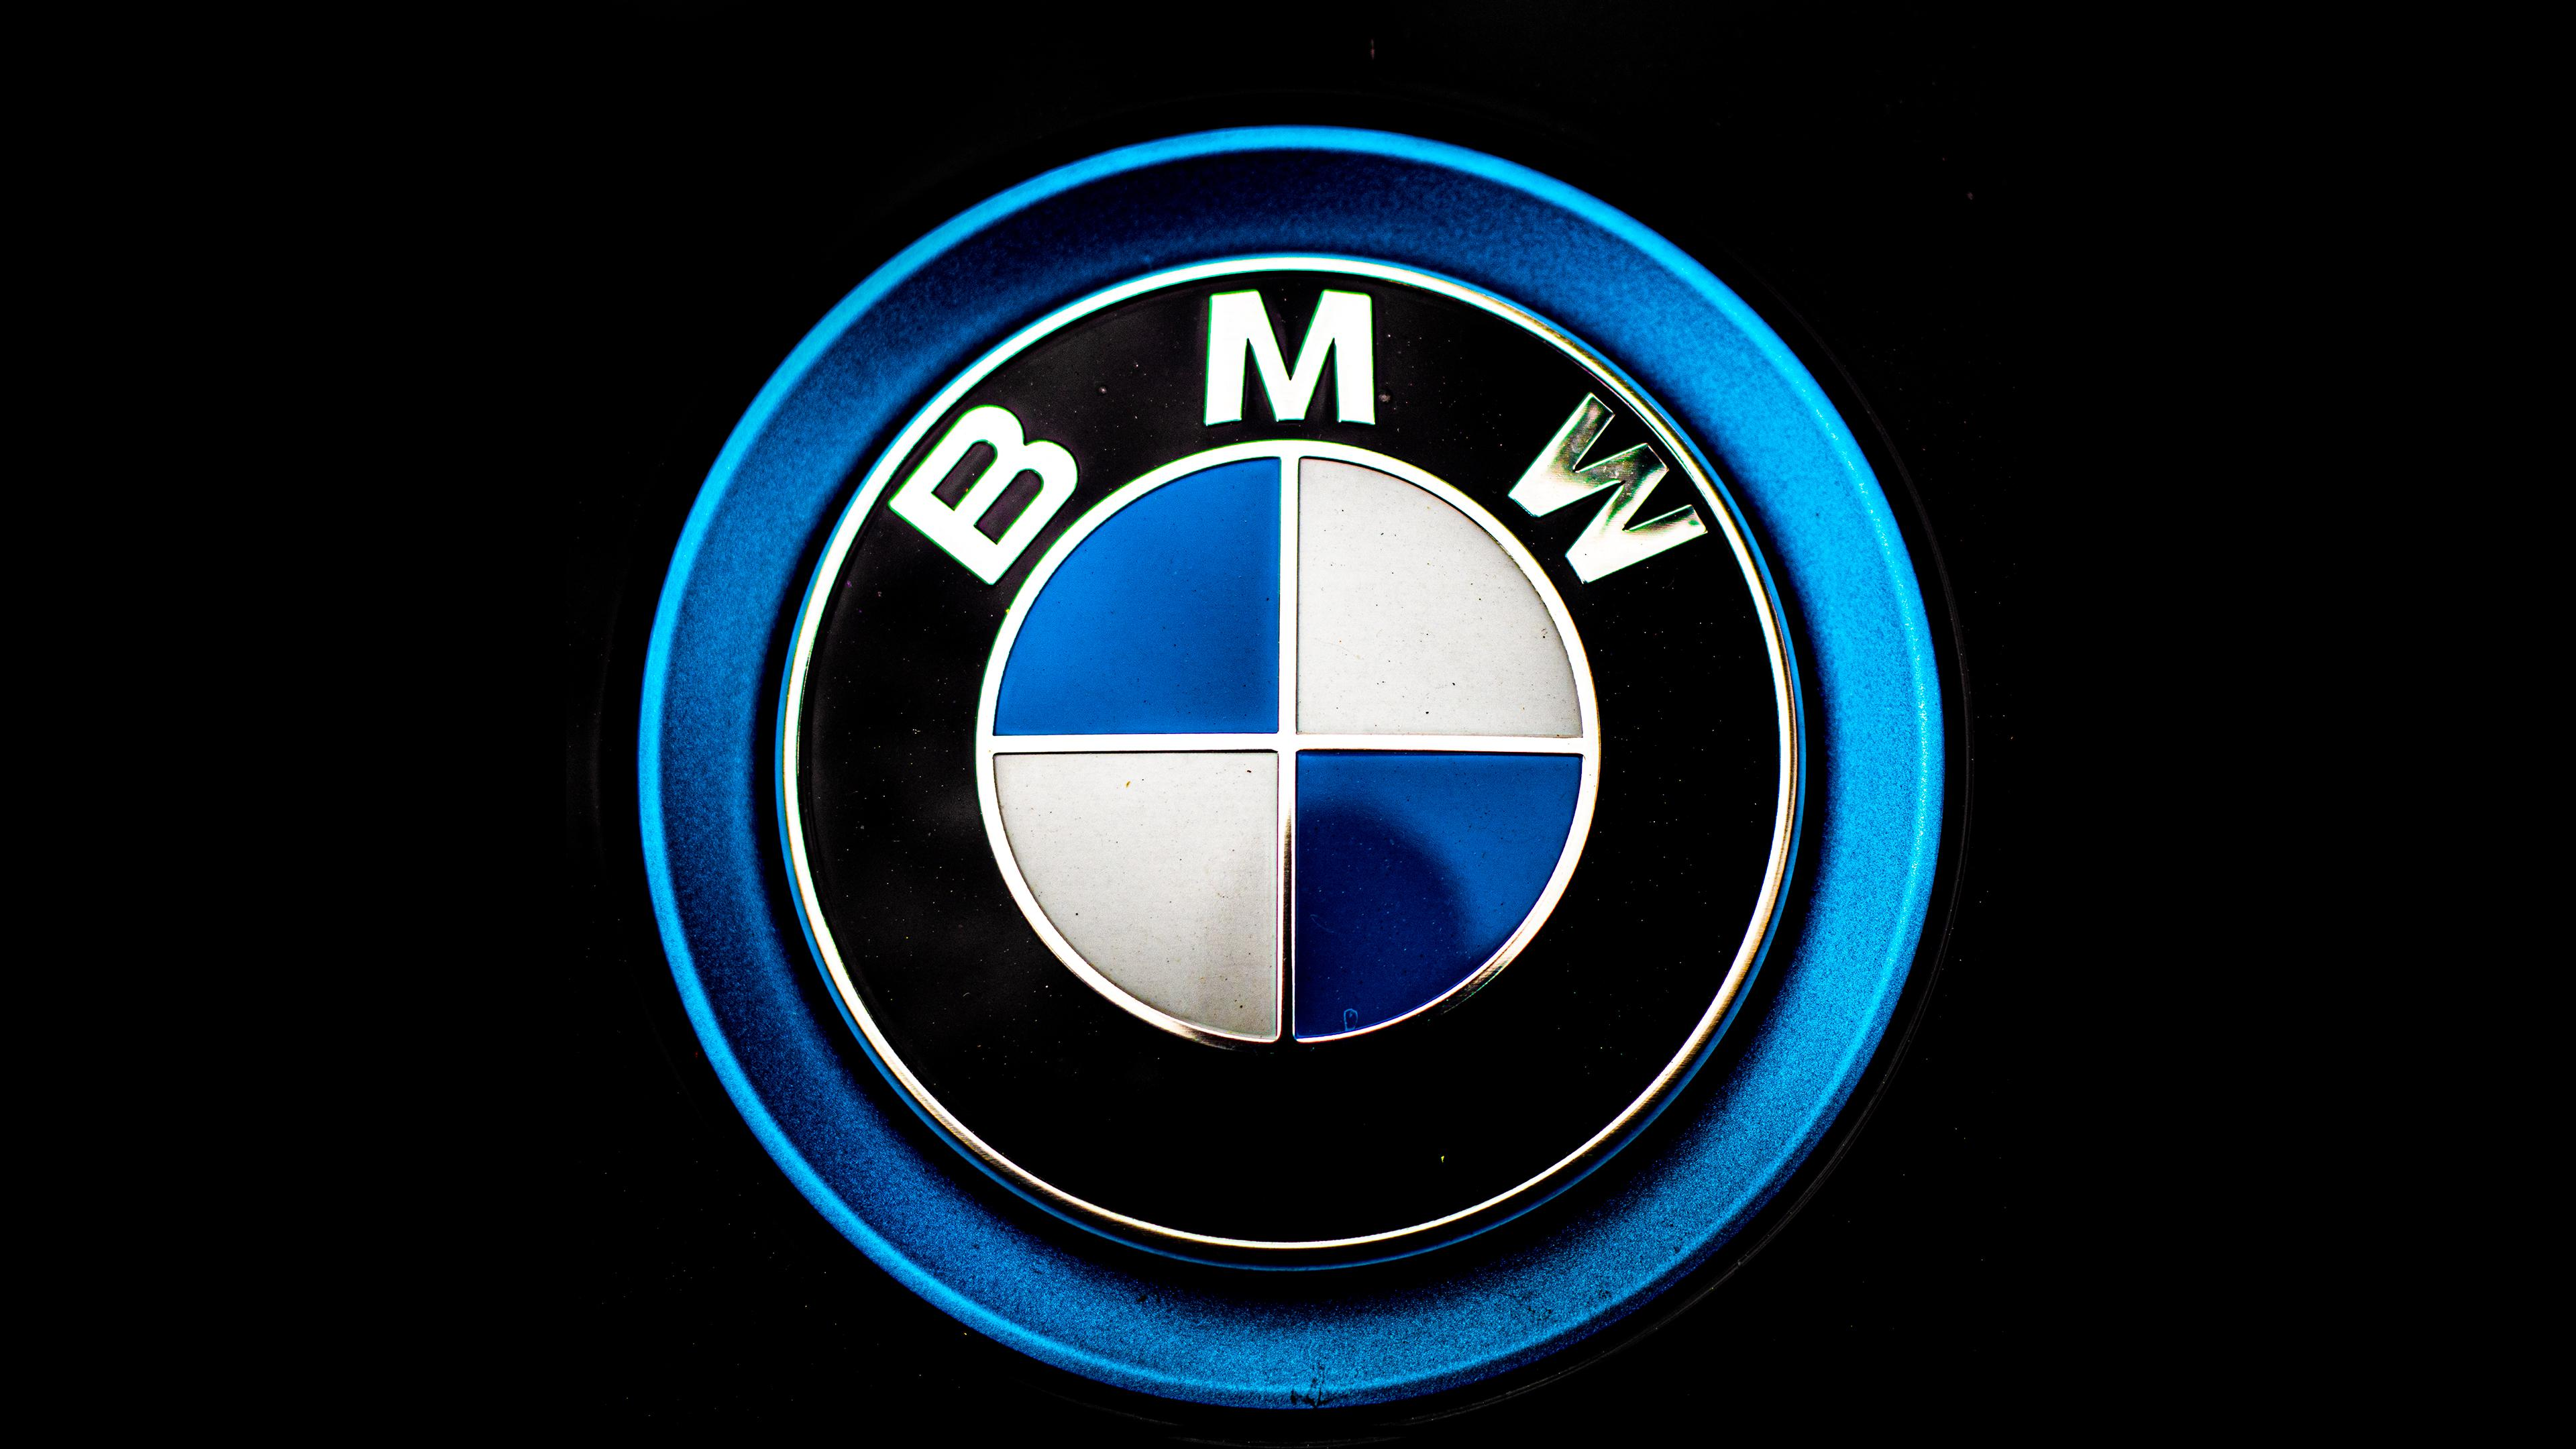 Bmw Logo Wallpapers Top Free Bmw Logo Backgrounds Wallpaperaccess